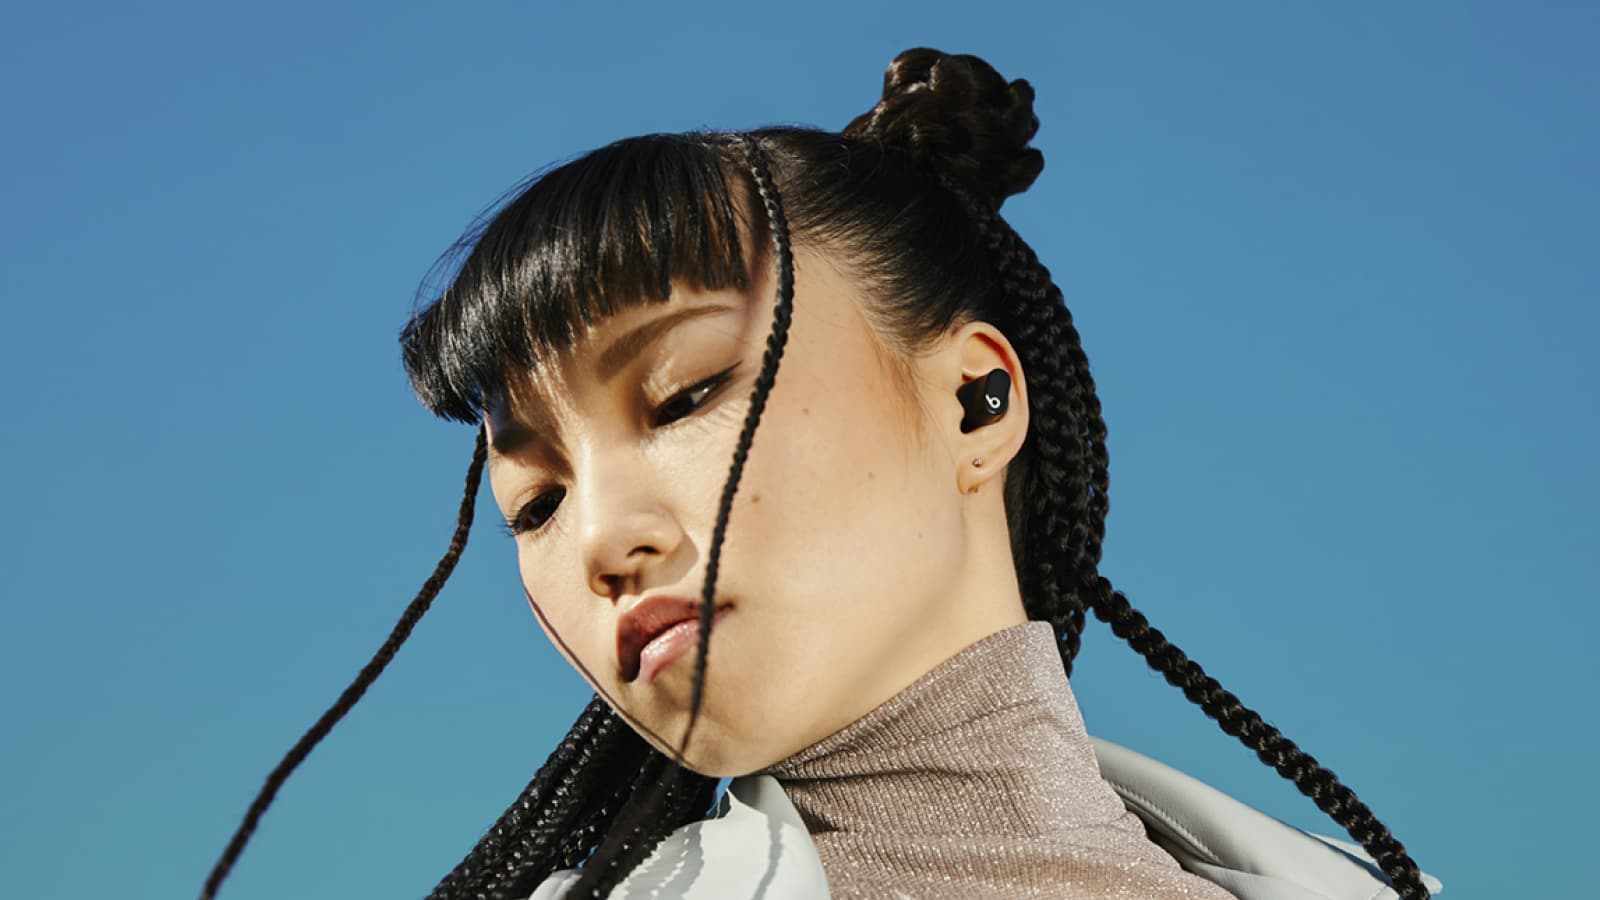 Black Beats Studio Buds Woman Lifestyle